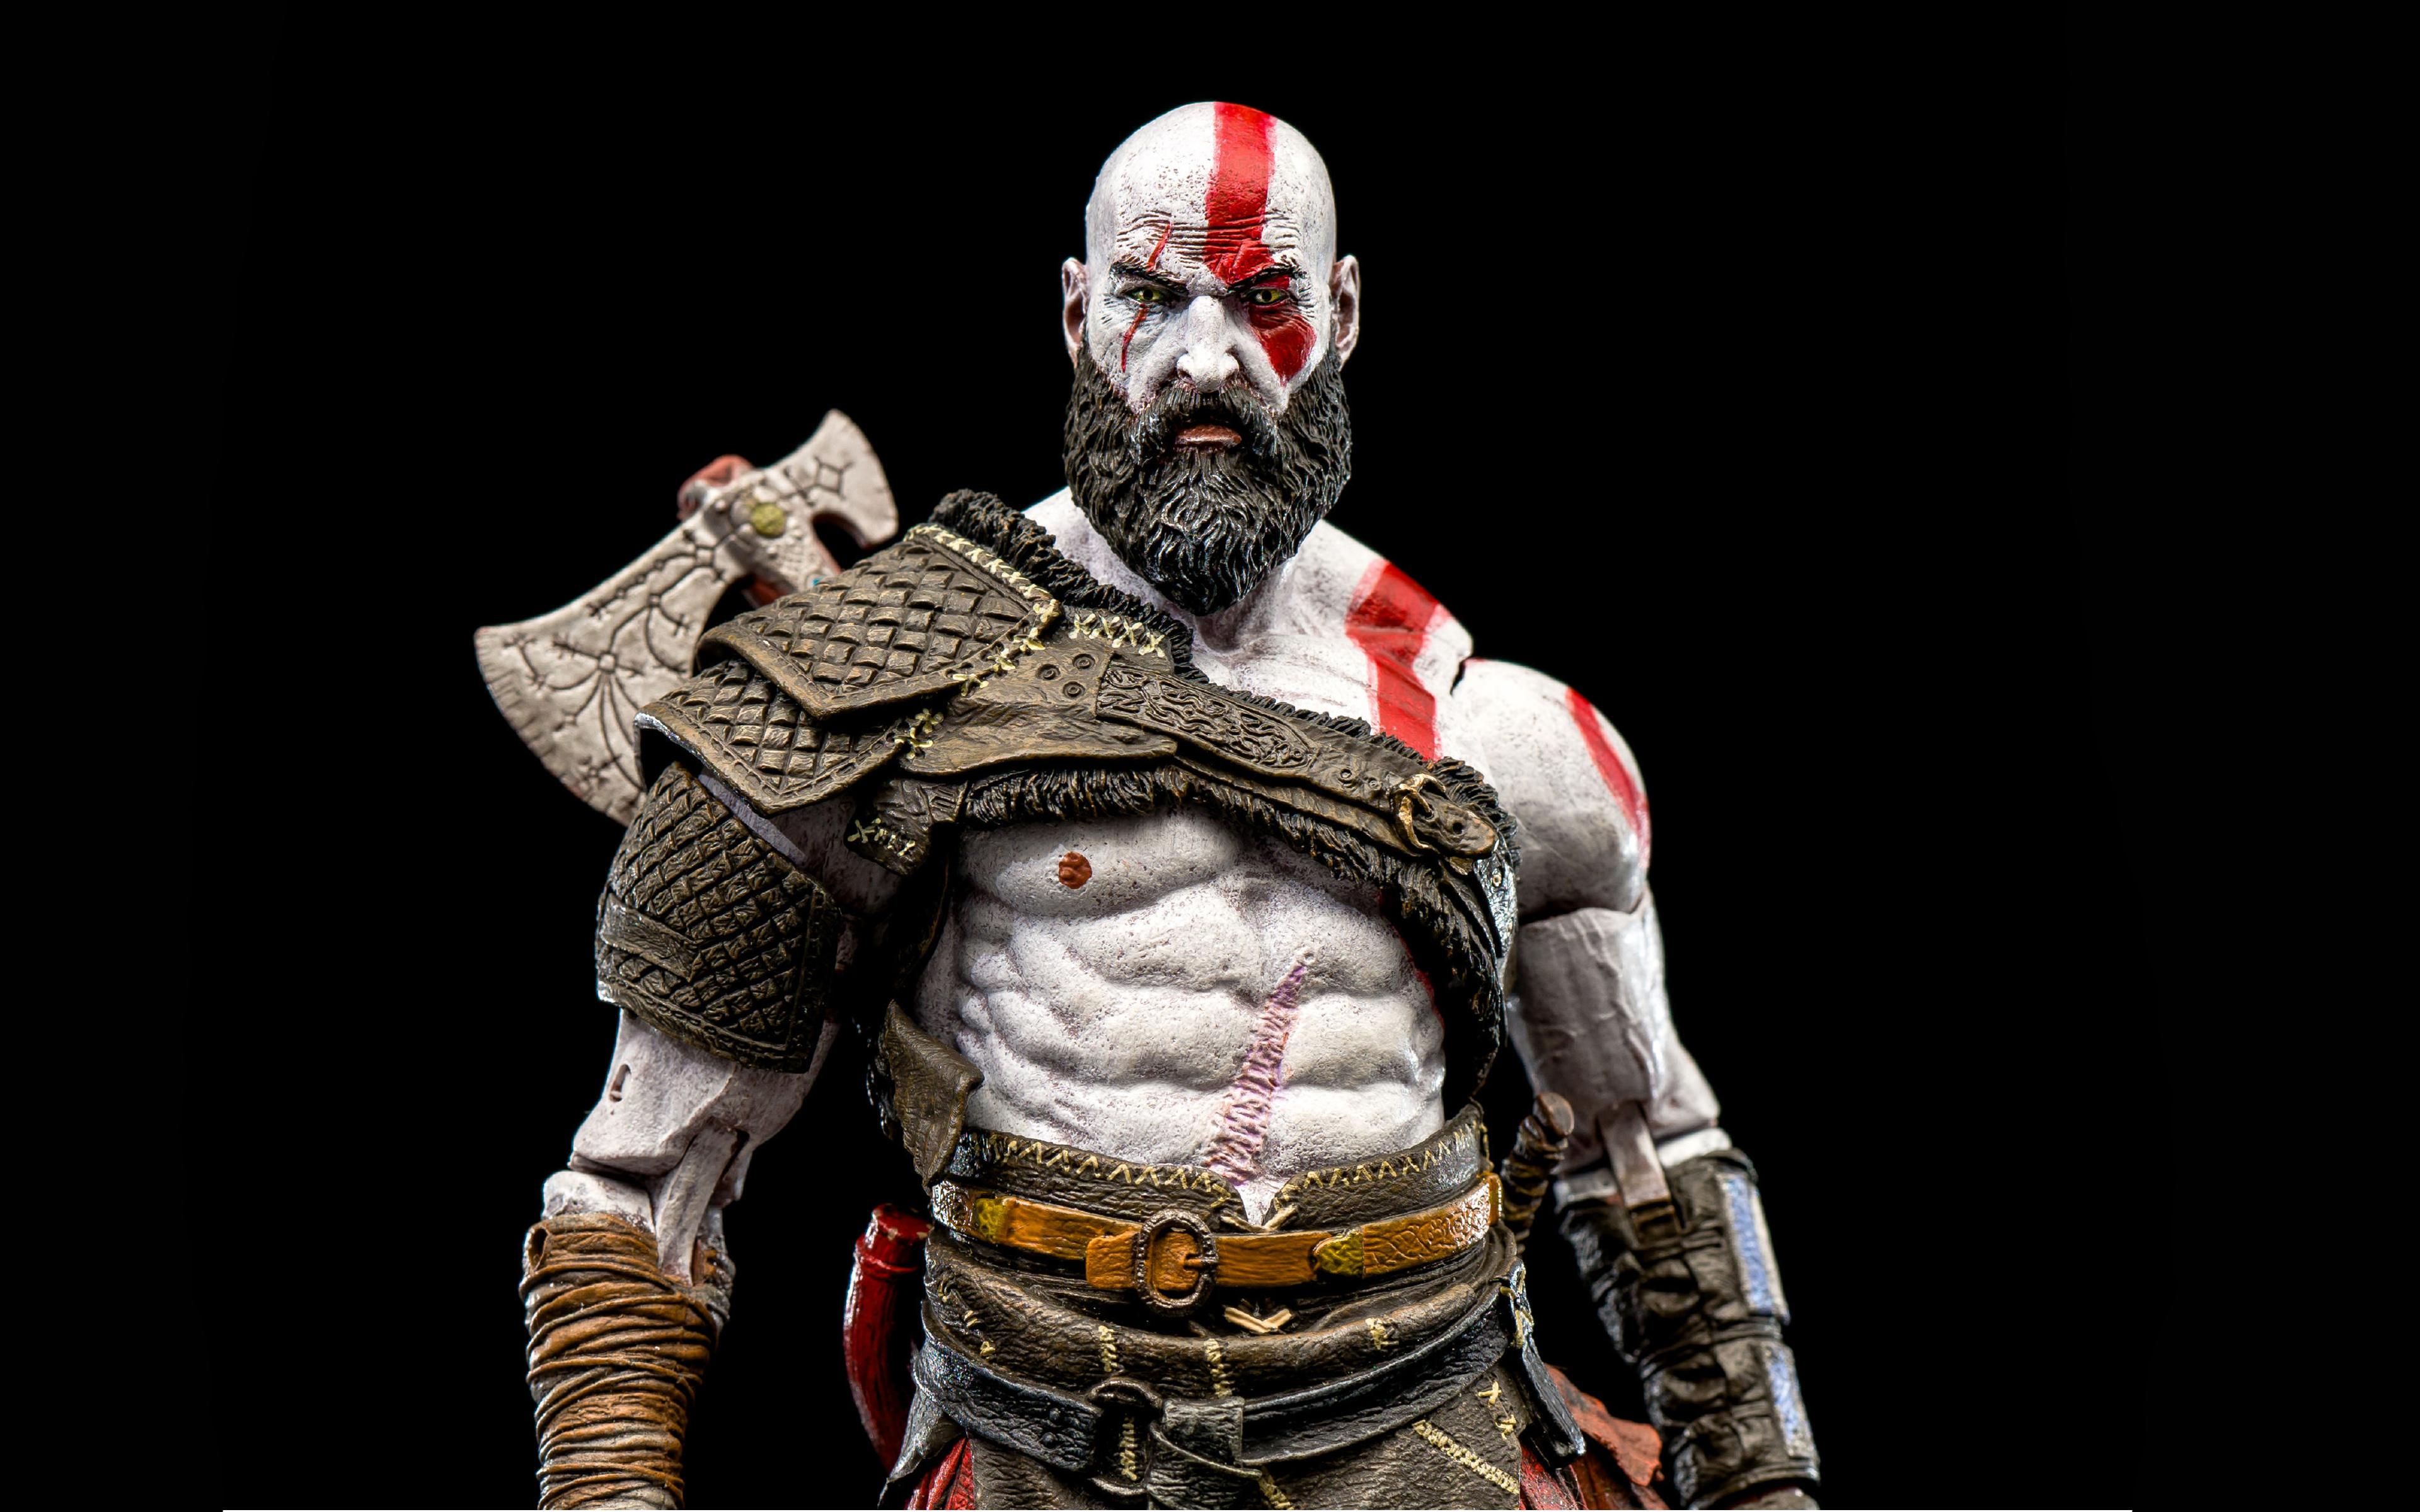 God Of War Kratos 2018 4k Wallpapers - Playstation God Of War 3 Kratos - HD Wallpaper